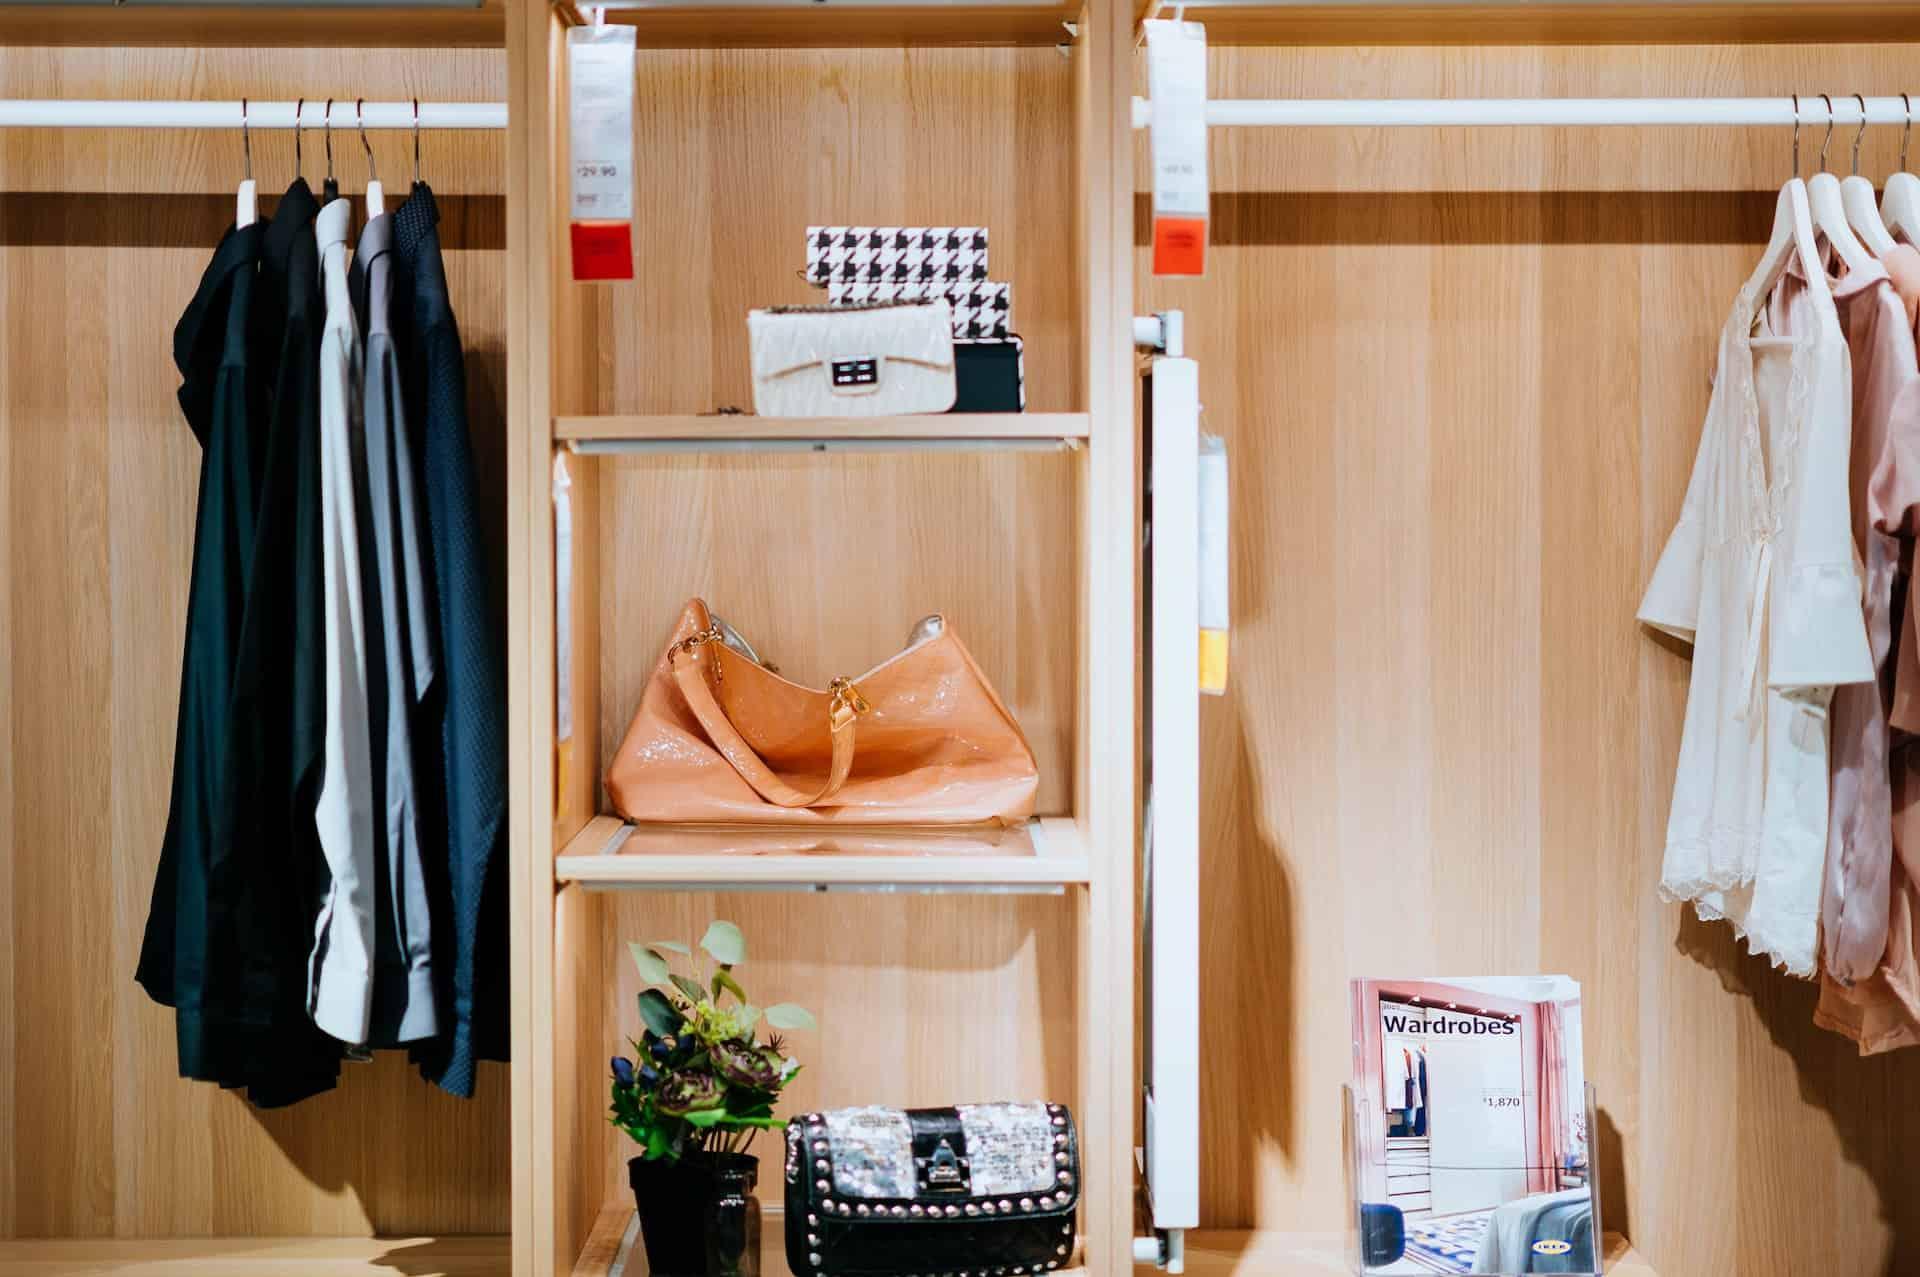 efficiency hub retail store setup